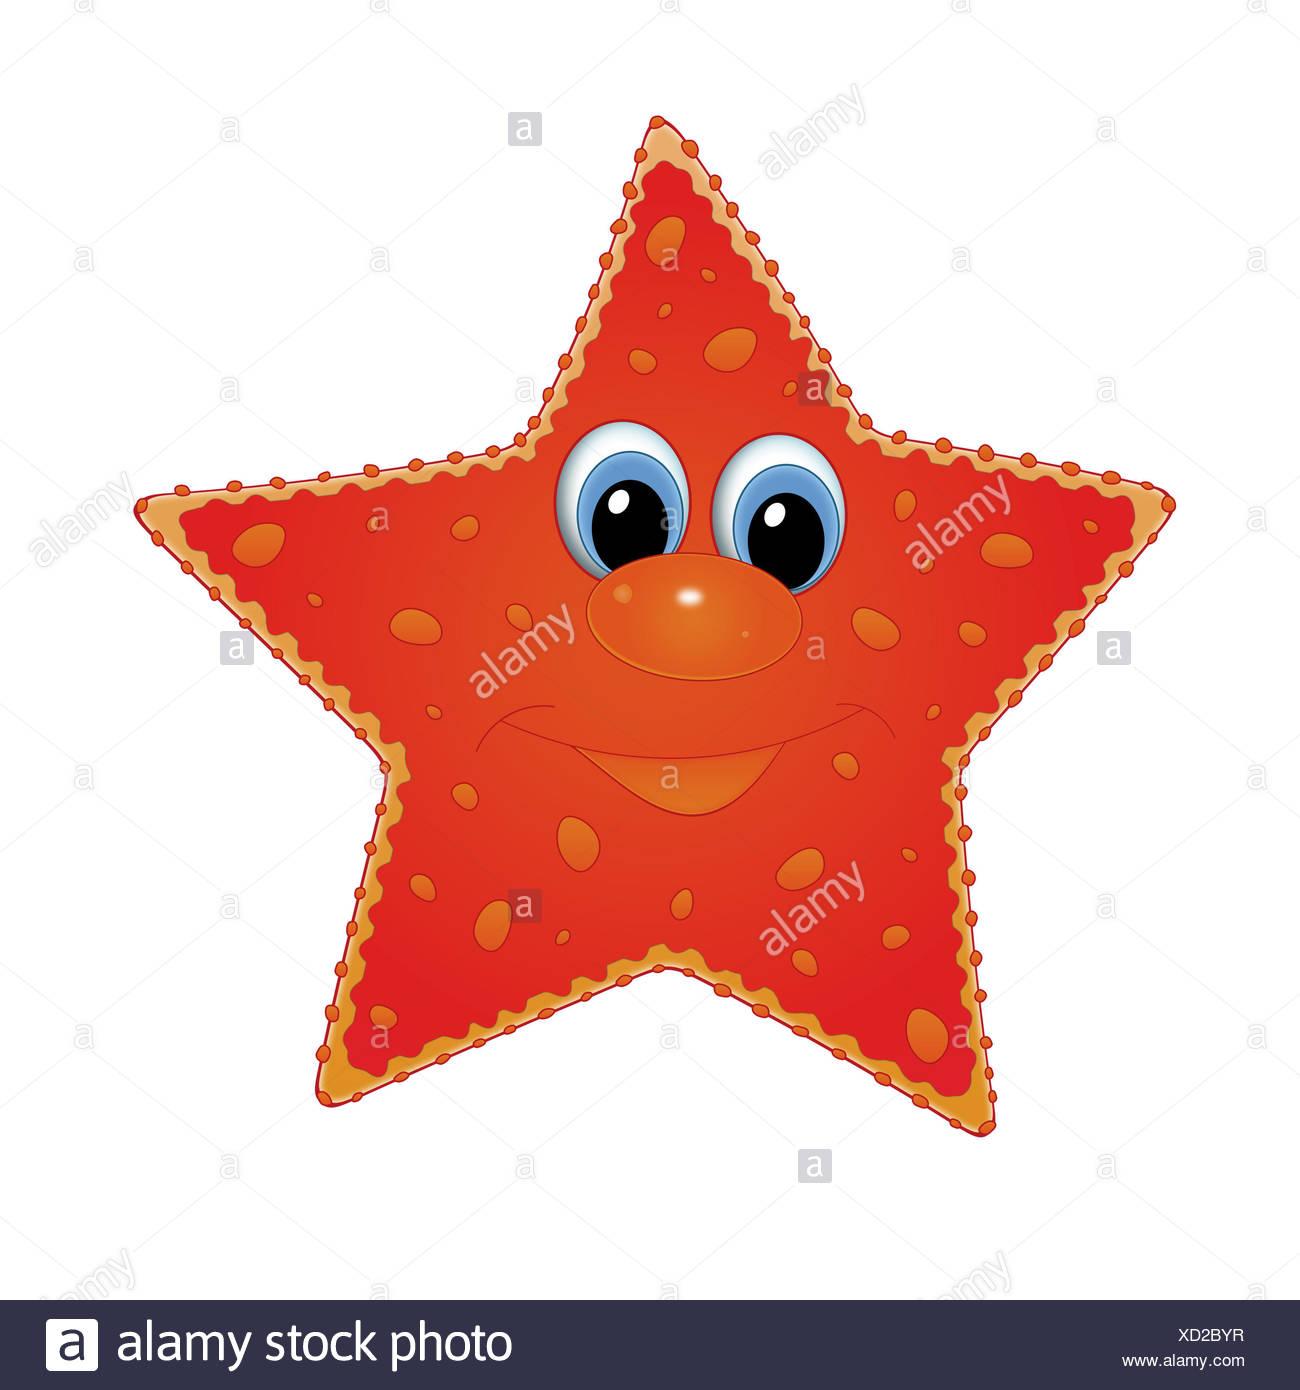 Starfish Drawing Stock Photos & Starfish Drawing Stock Images - Page ...